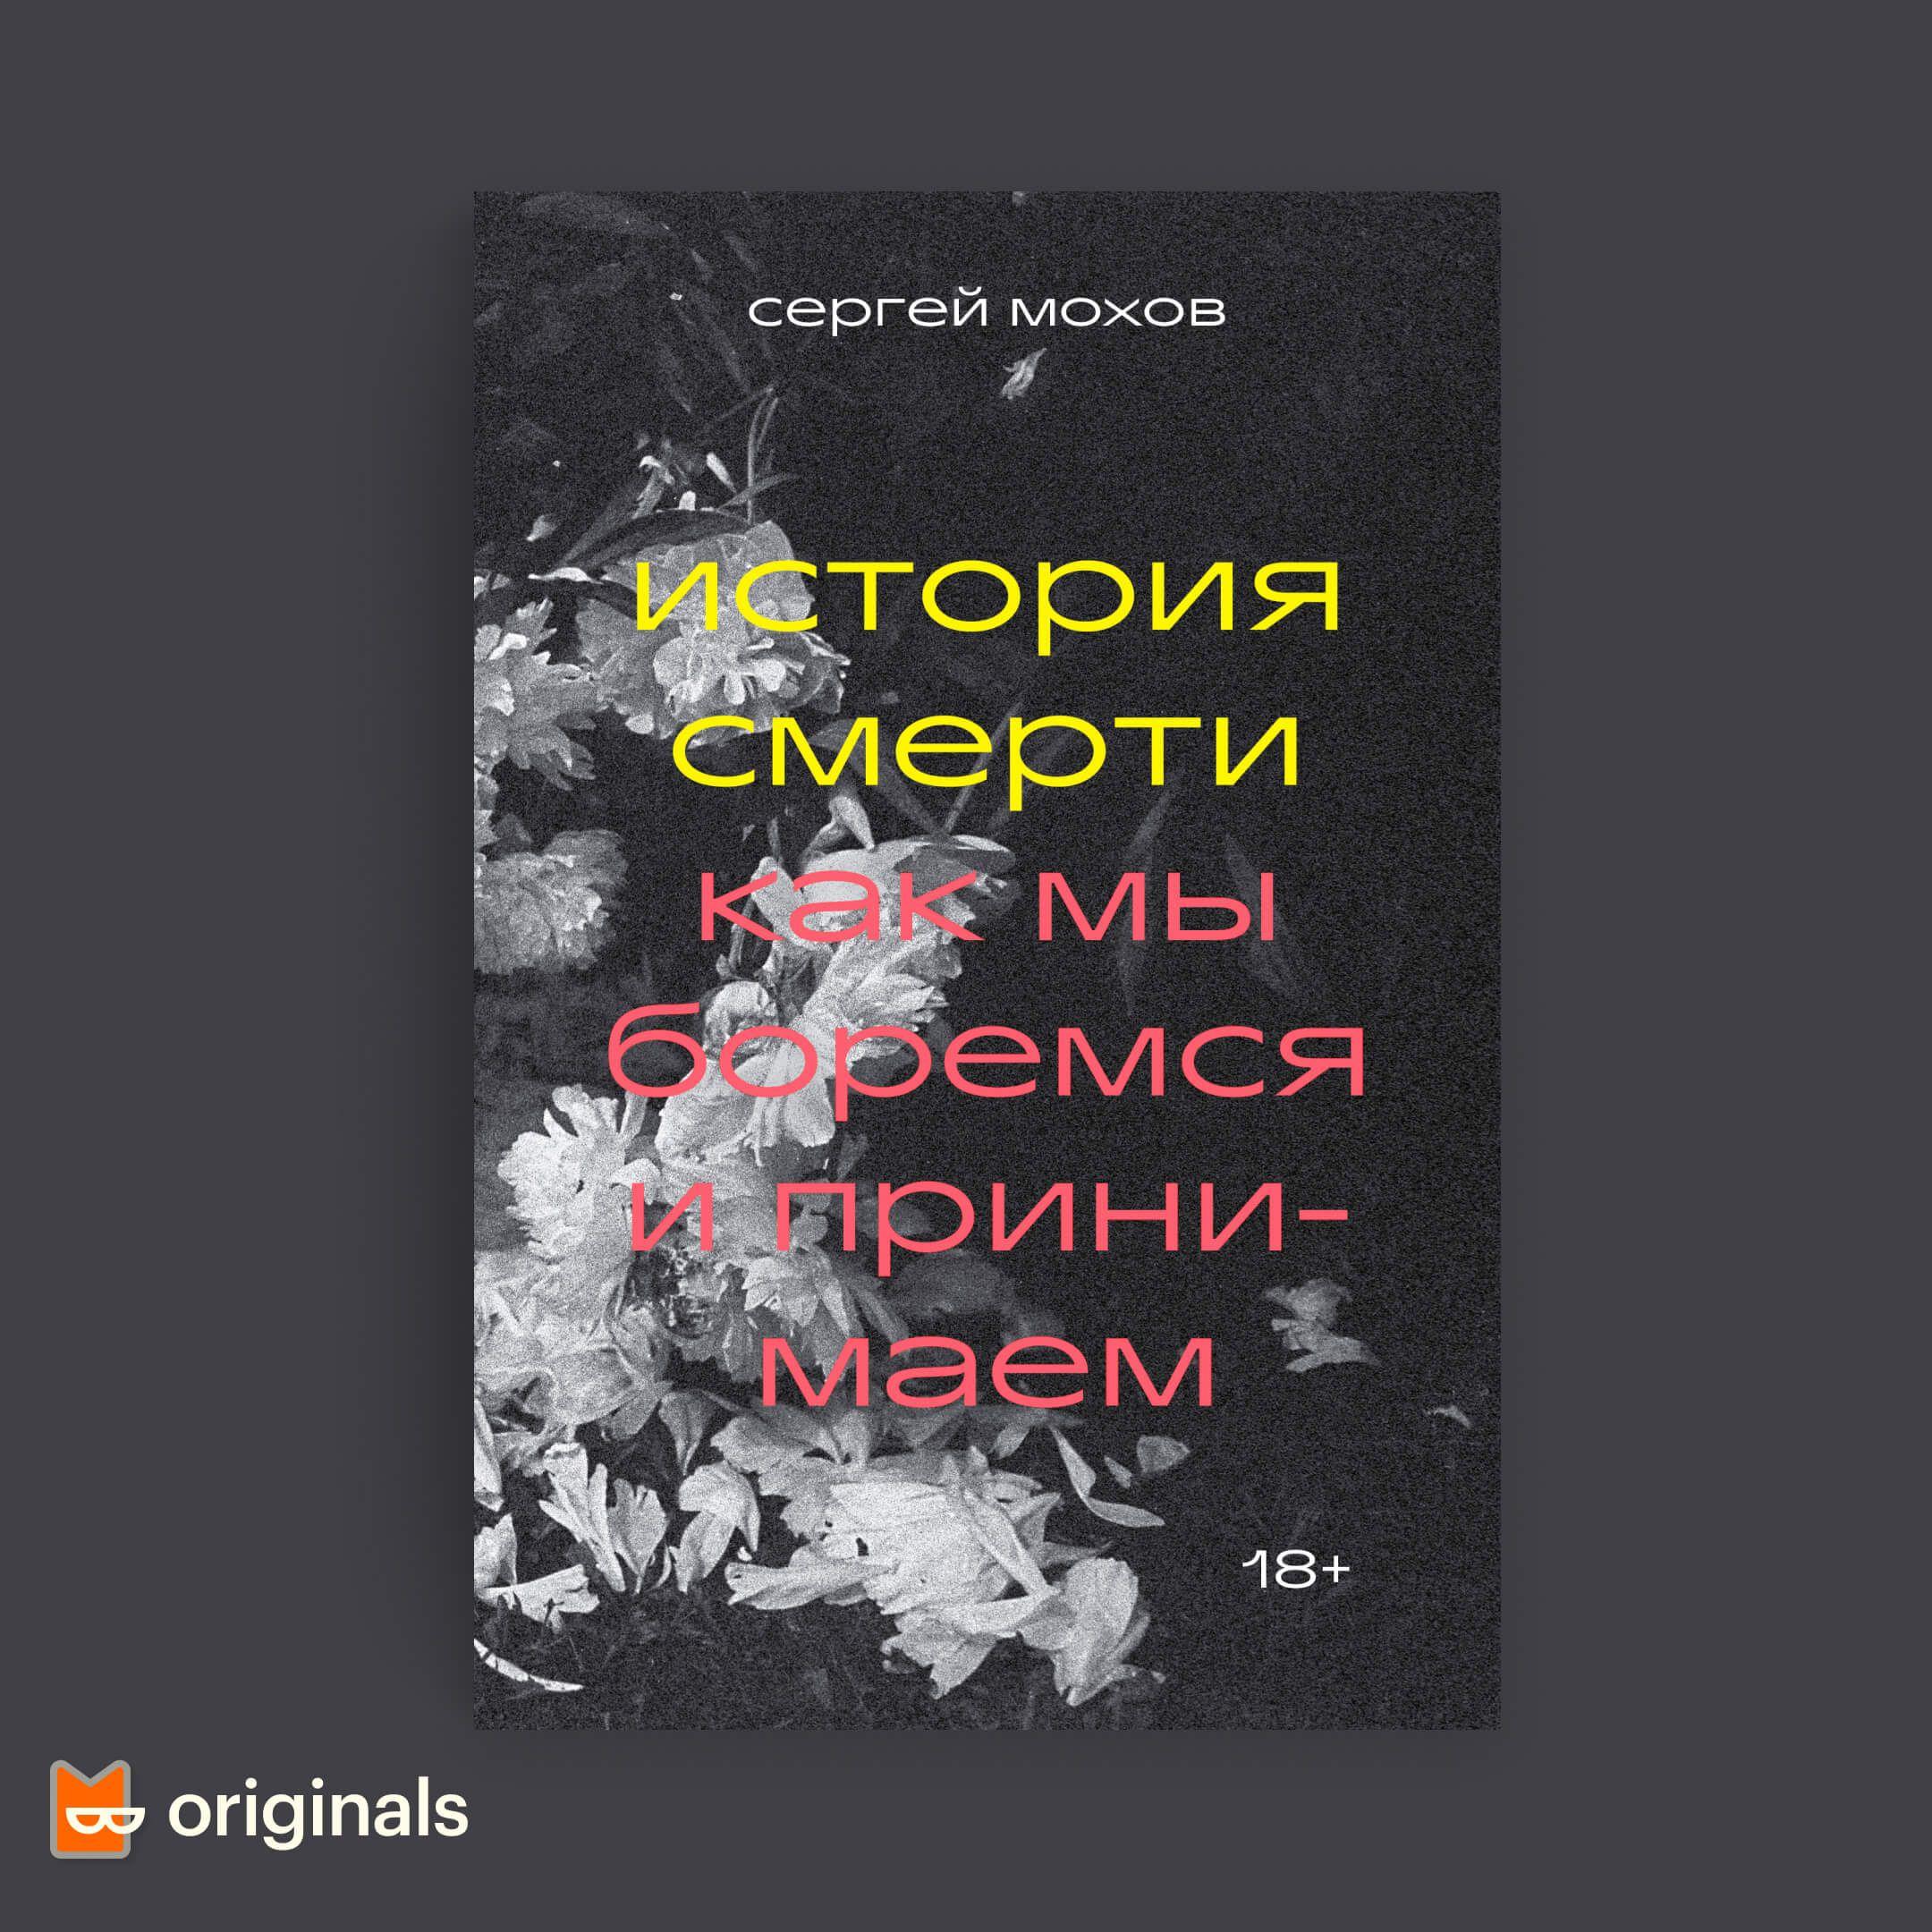 Обложка книги «История смерти» Сергея Мохова